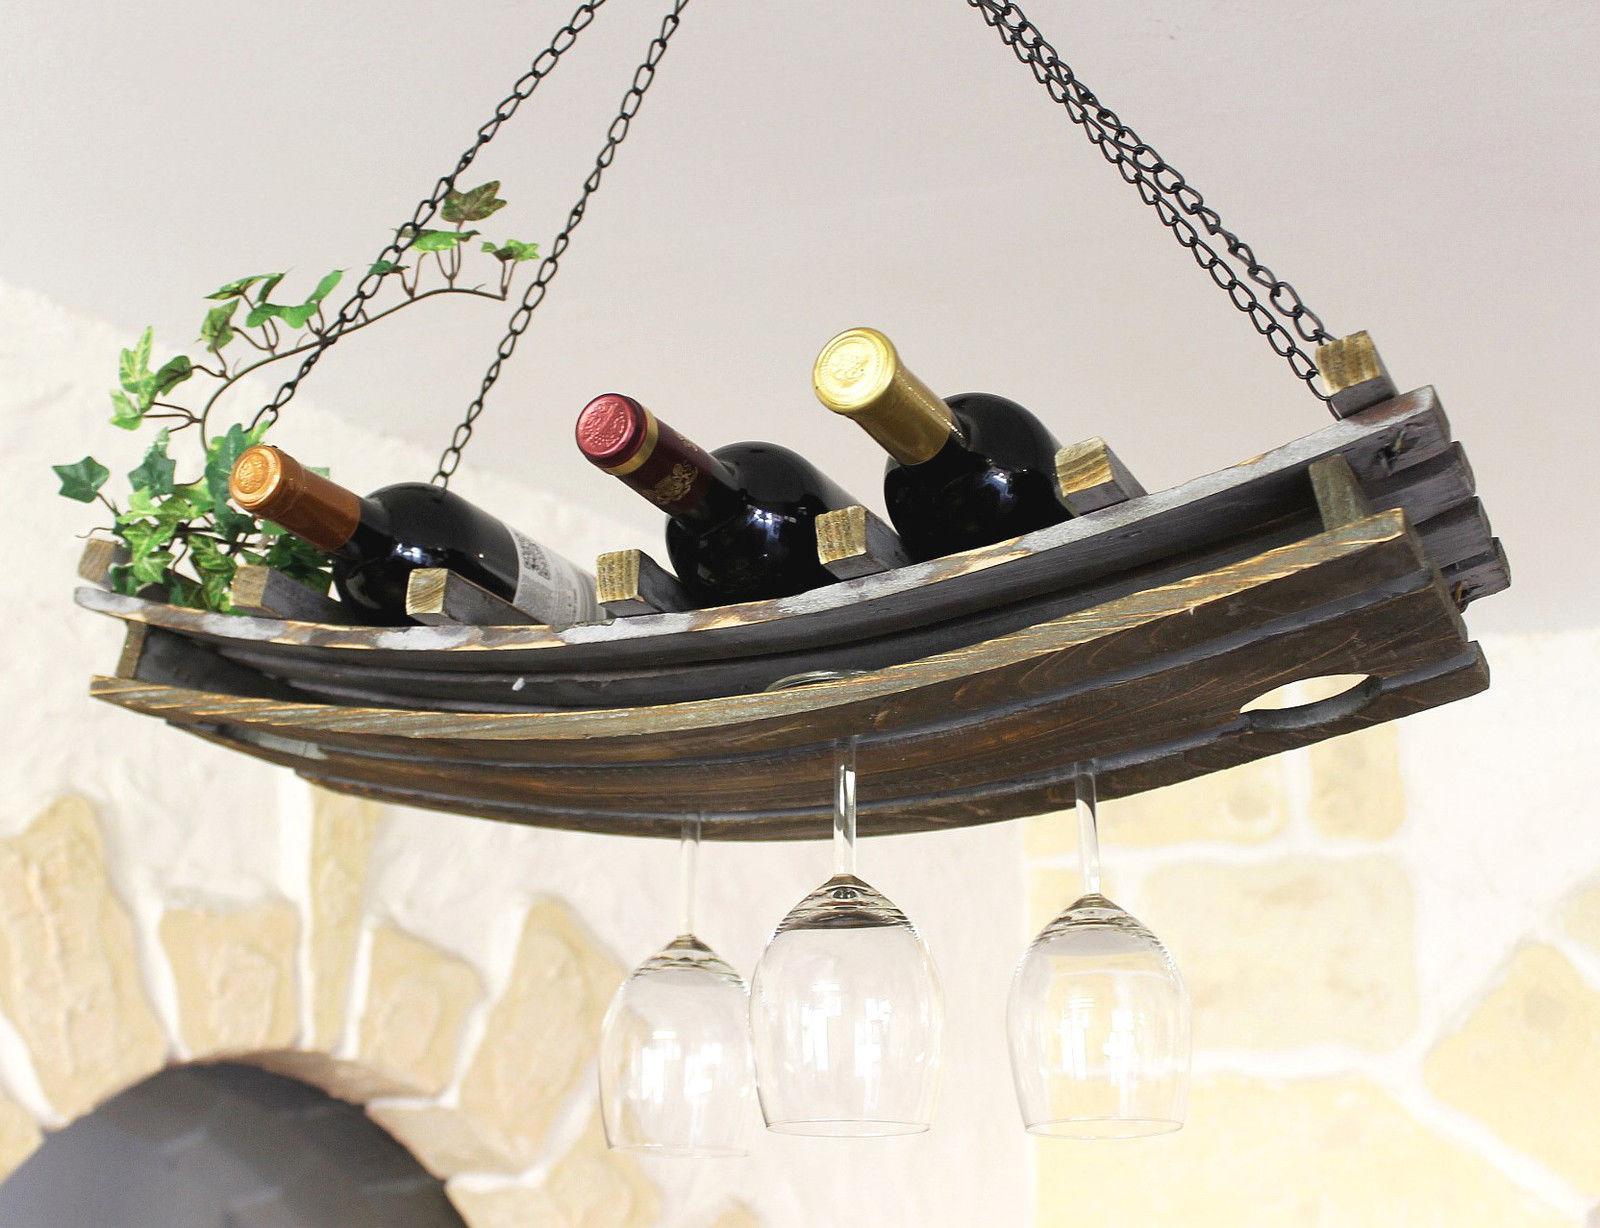 weinregal deckenregal holz 65cm h ngeregal flaschenhalter flaschenregal decke ebay. Black Bedroom Furniture Sets. Home Design Ideas